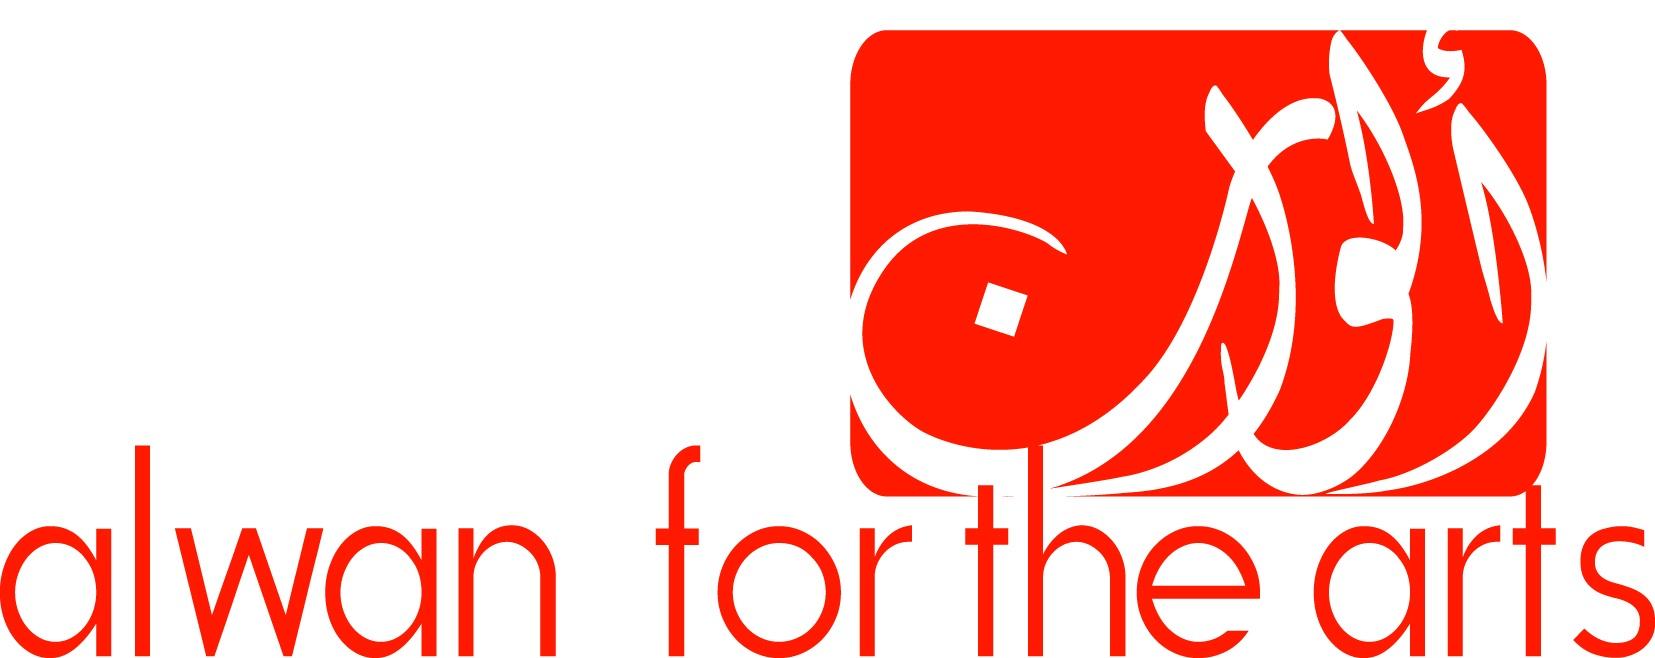 alwan logo final 10-2013